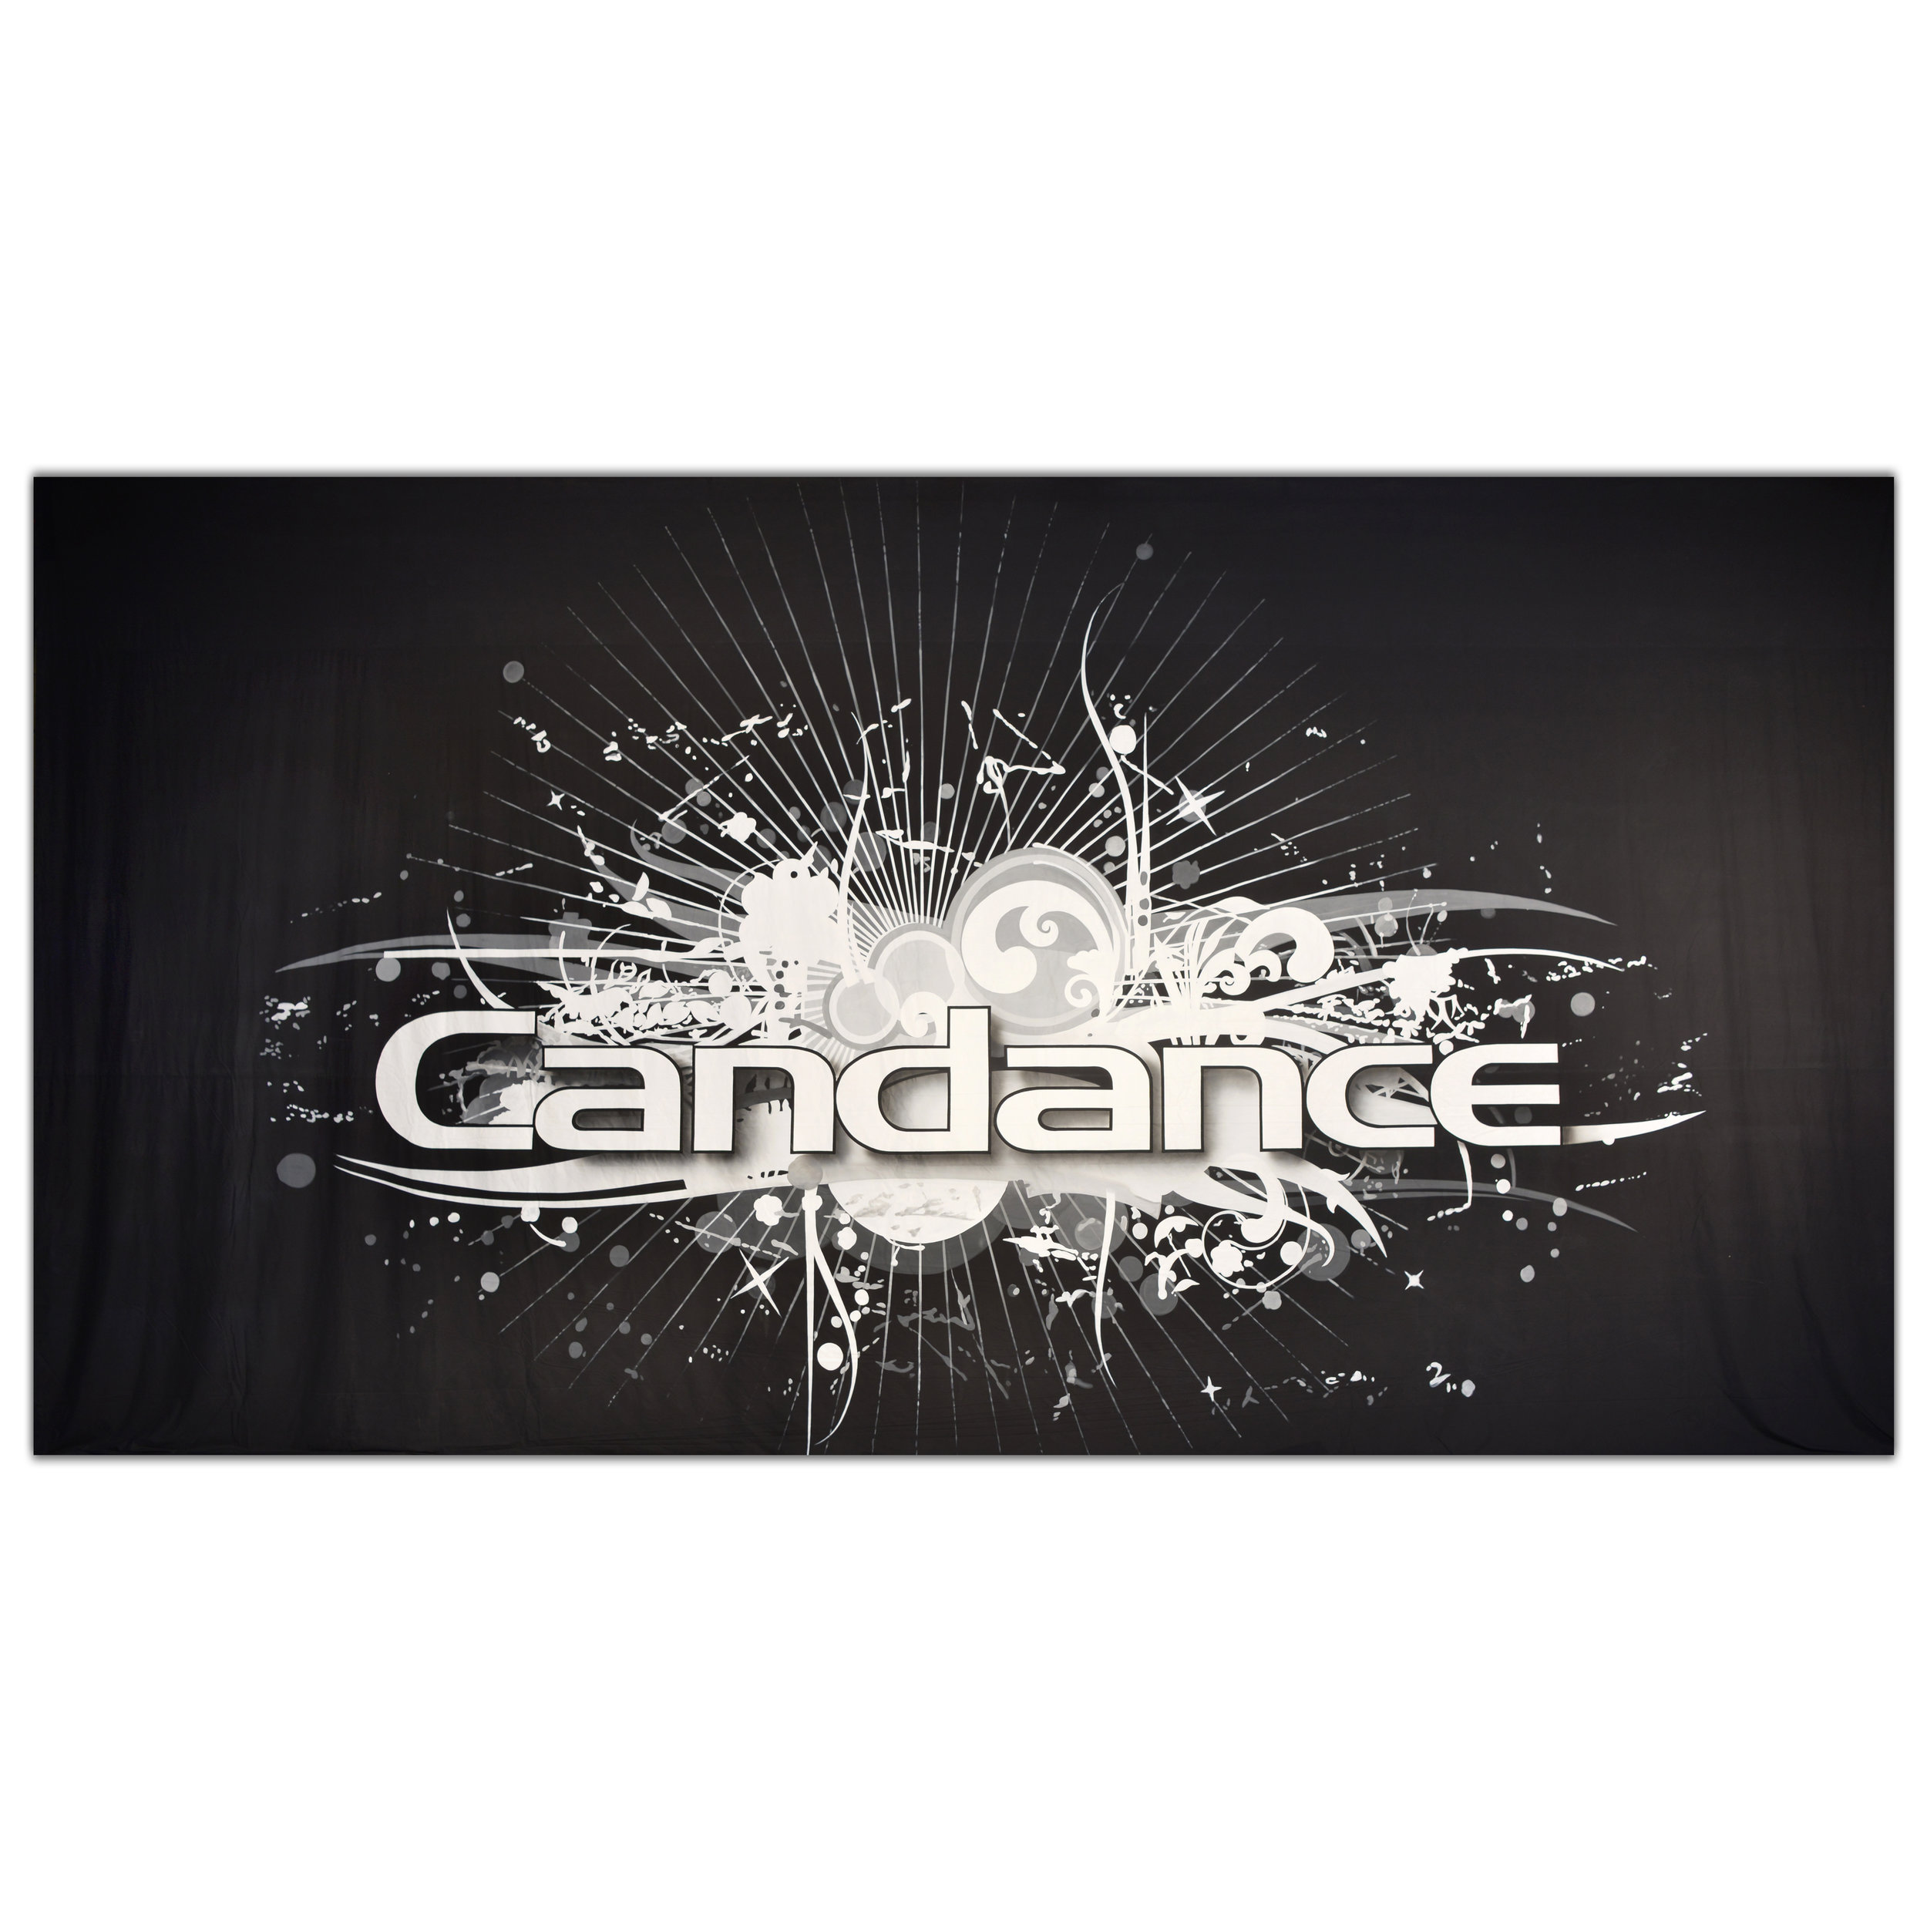 Candance BW Drop square.jpg